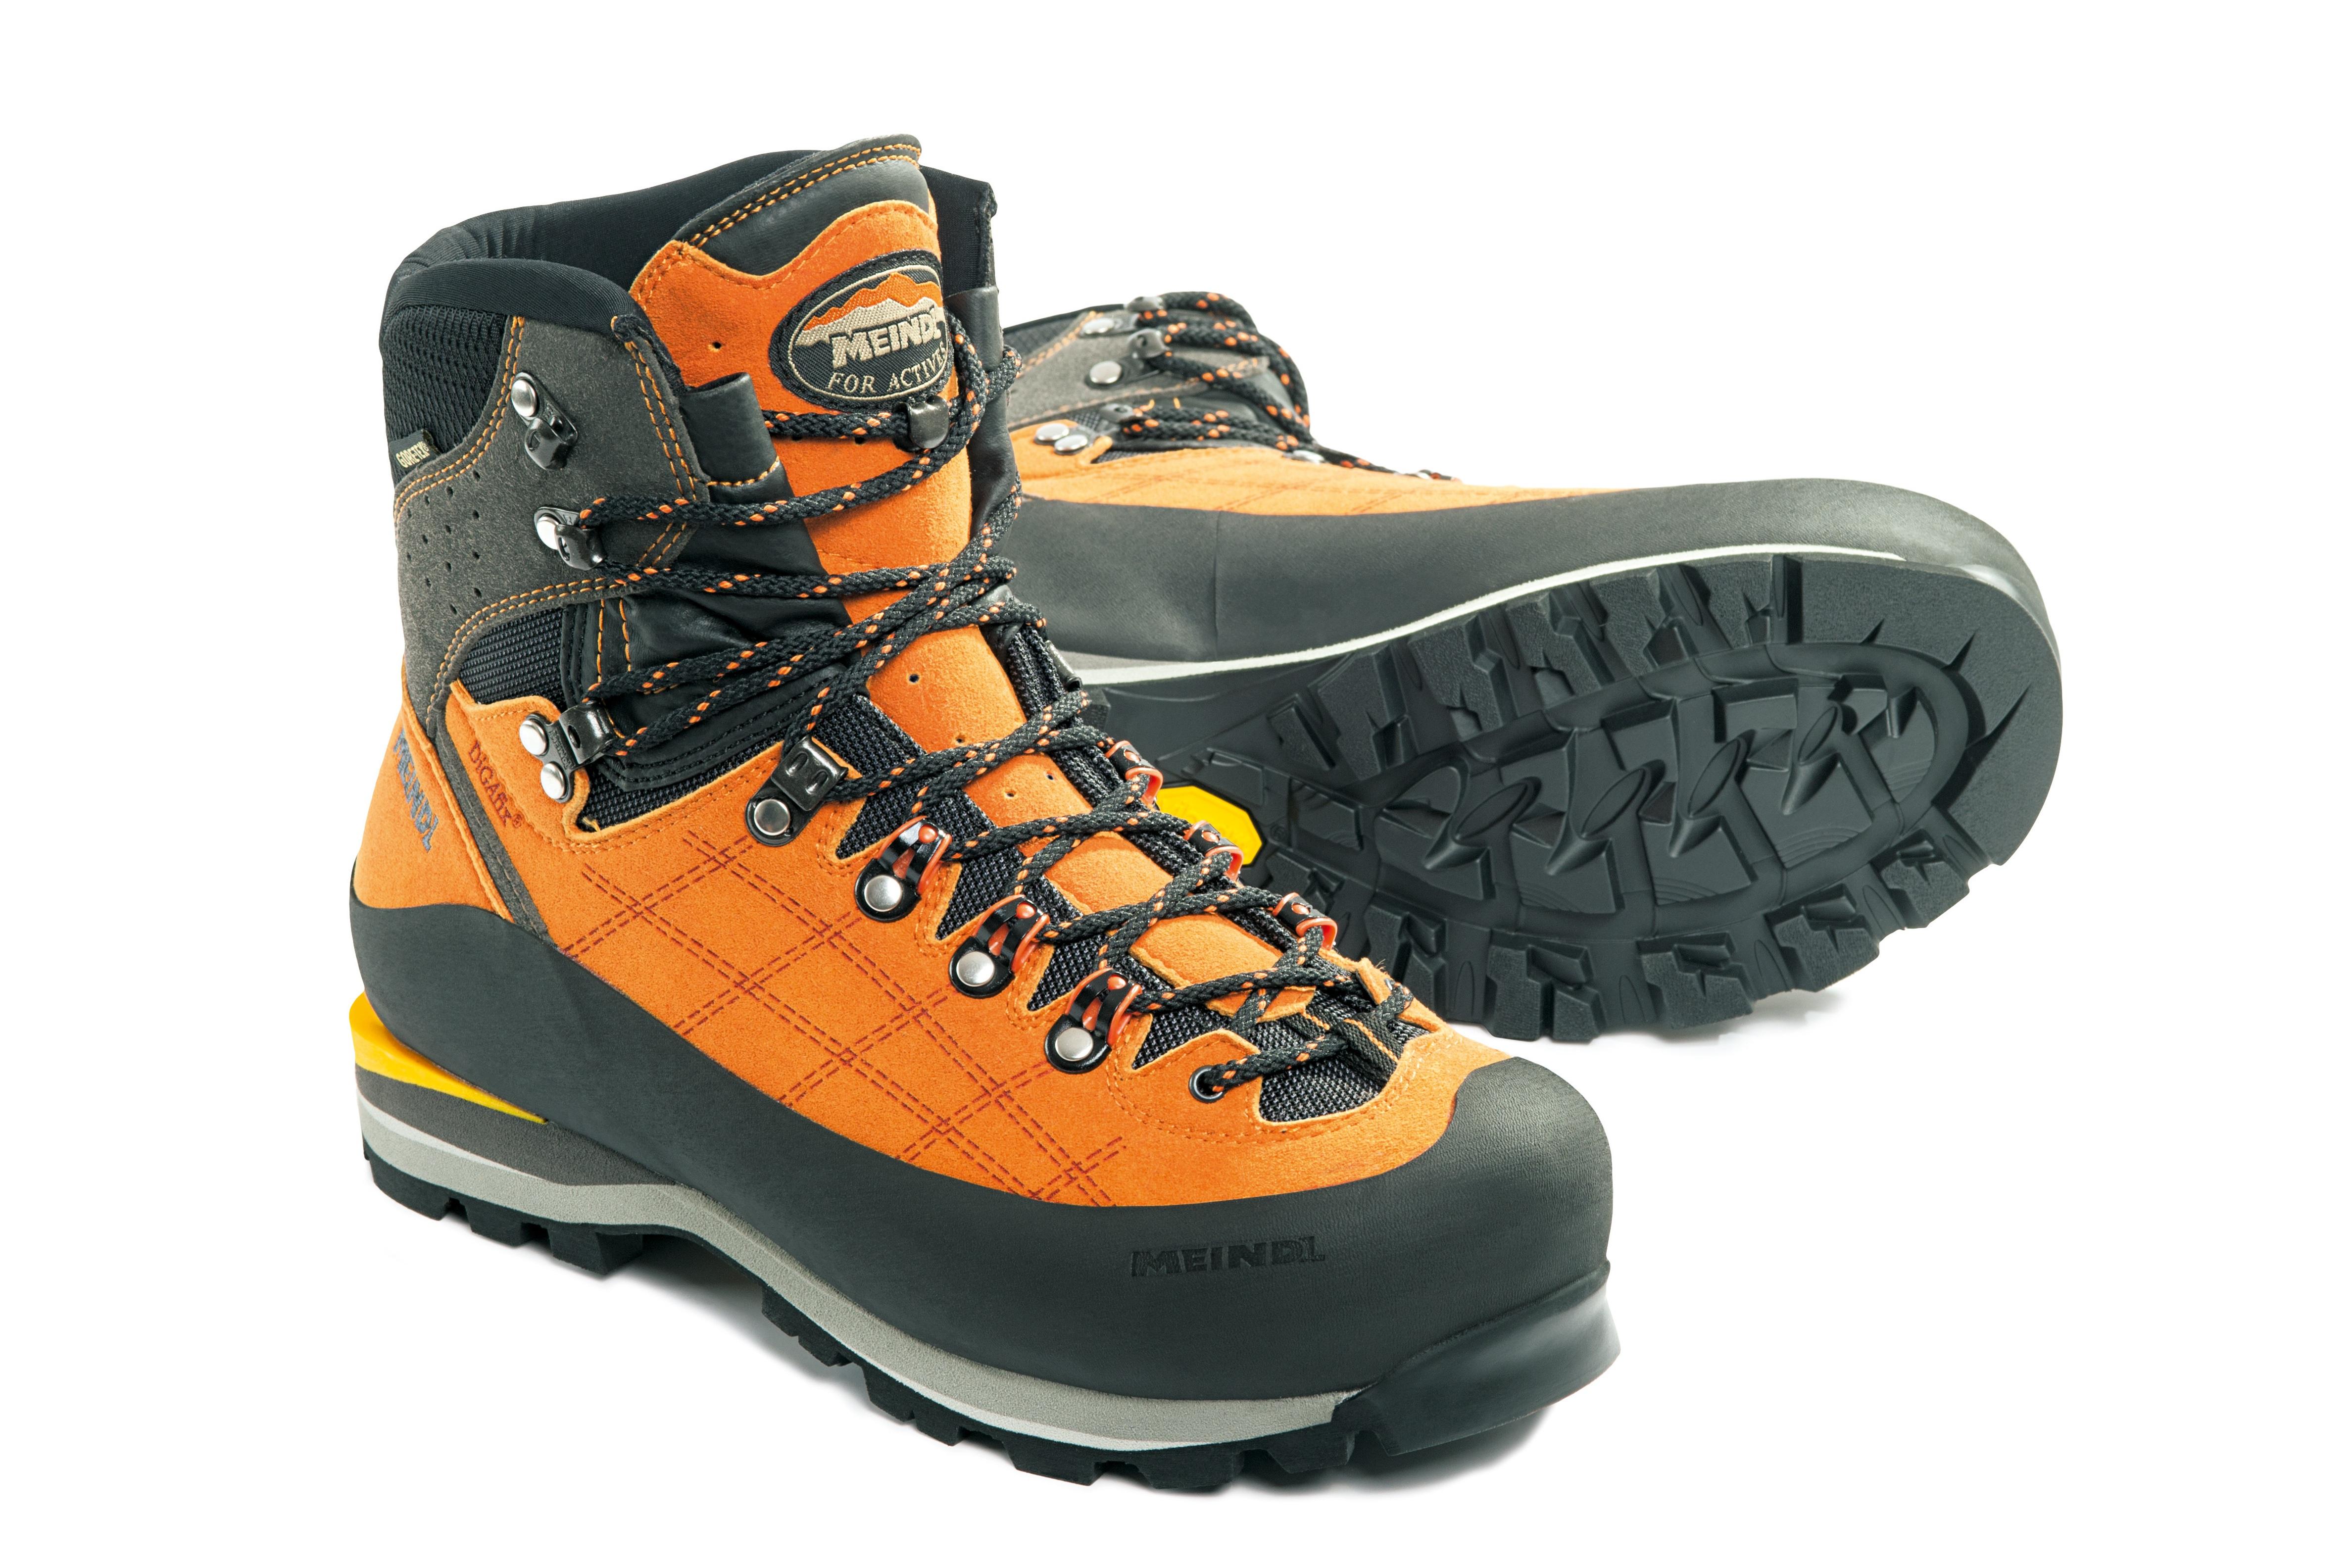 sepatu Hiking olahraga Jeruk peralatan olahraga sepatu mendaki Abu-abu sepatu kets alas kaki sepatu